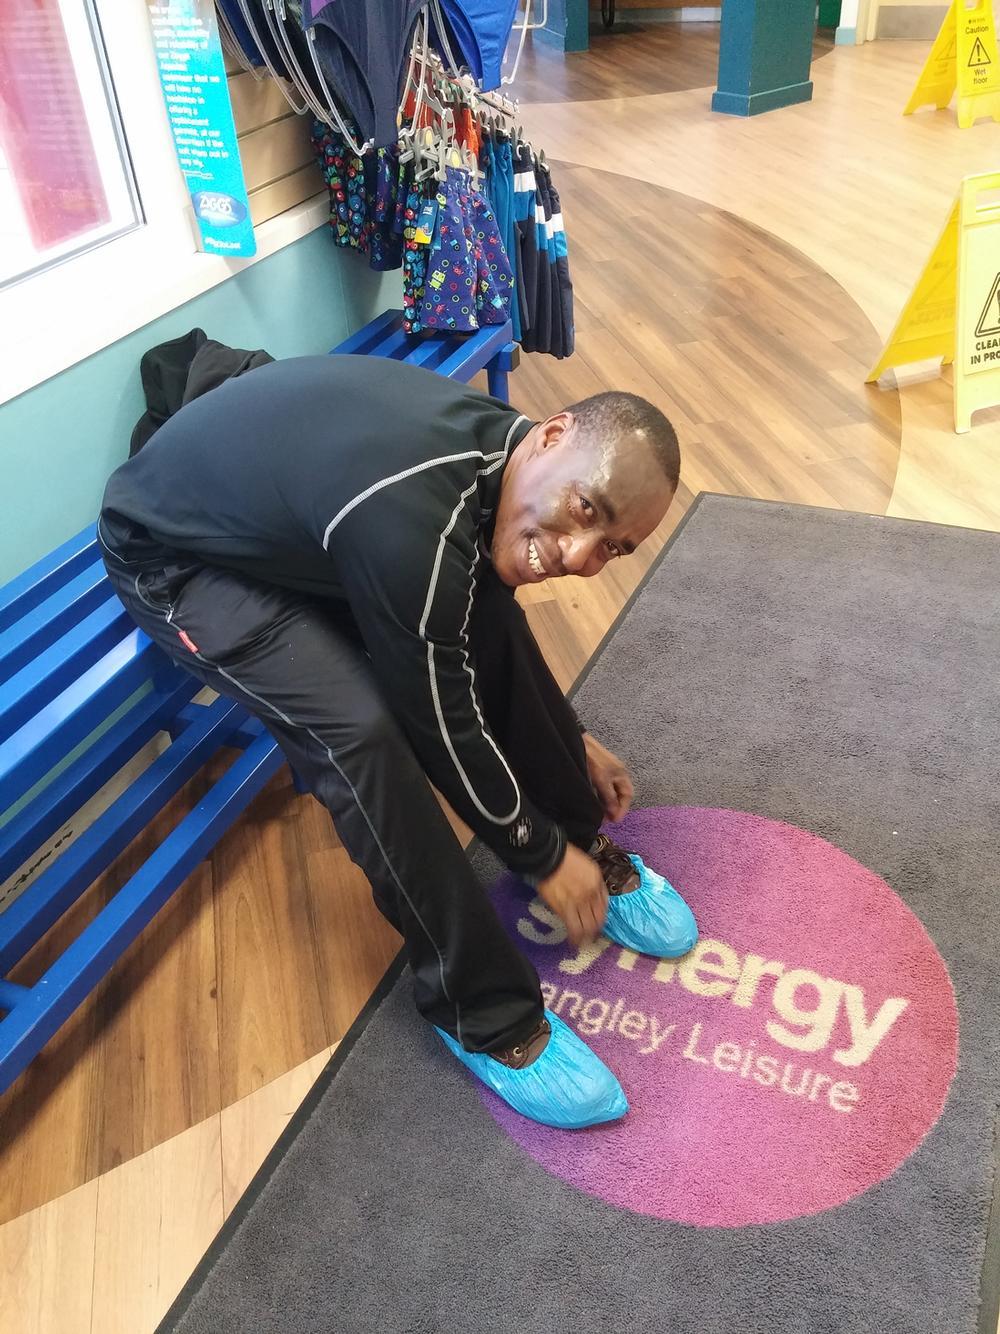 Overshoe protectors help keep changing rooms clean